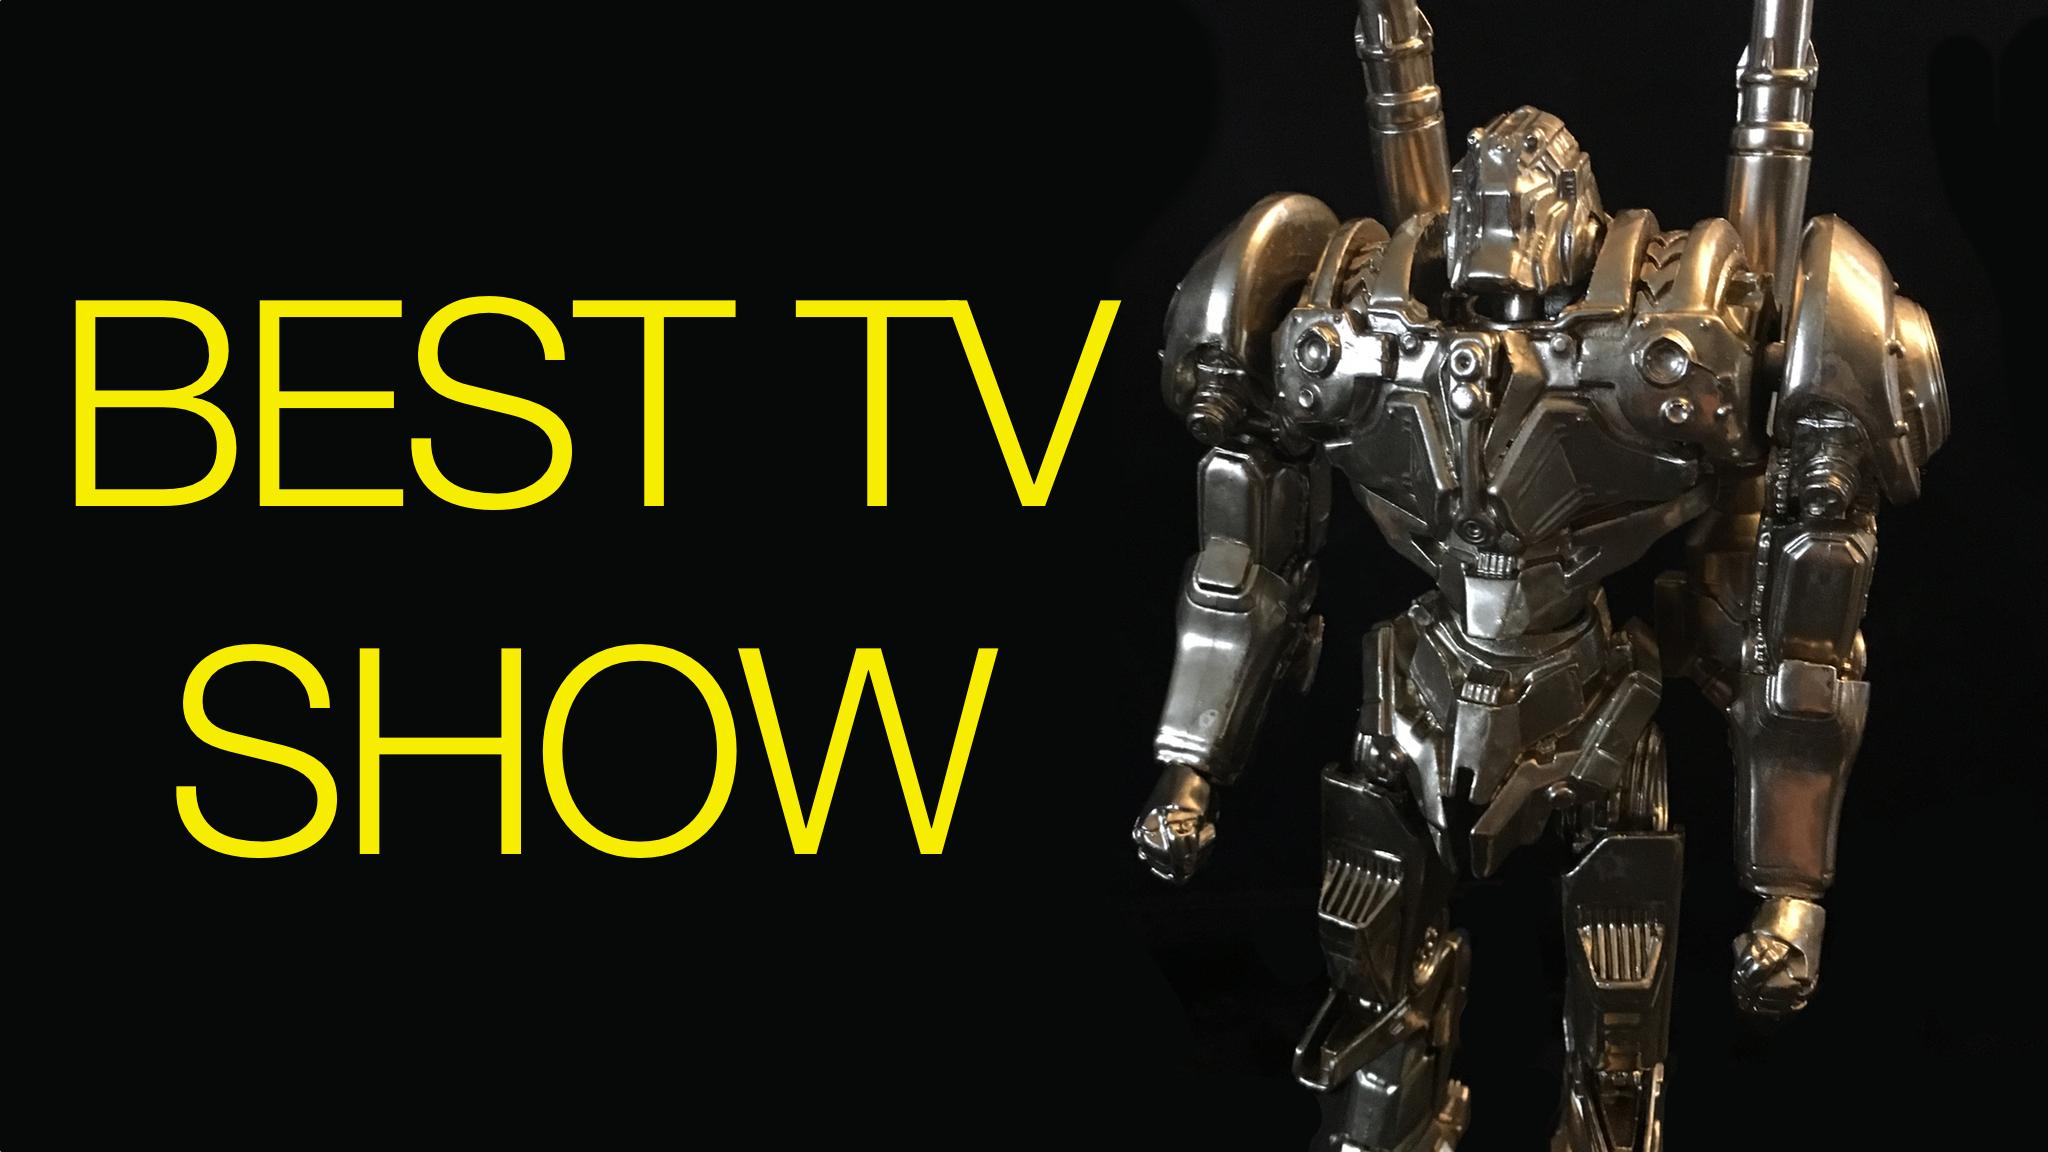 BEST TV 2048X1152.jpg